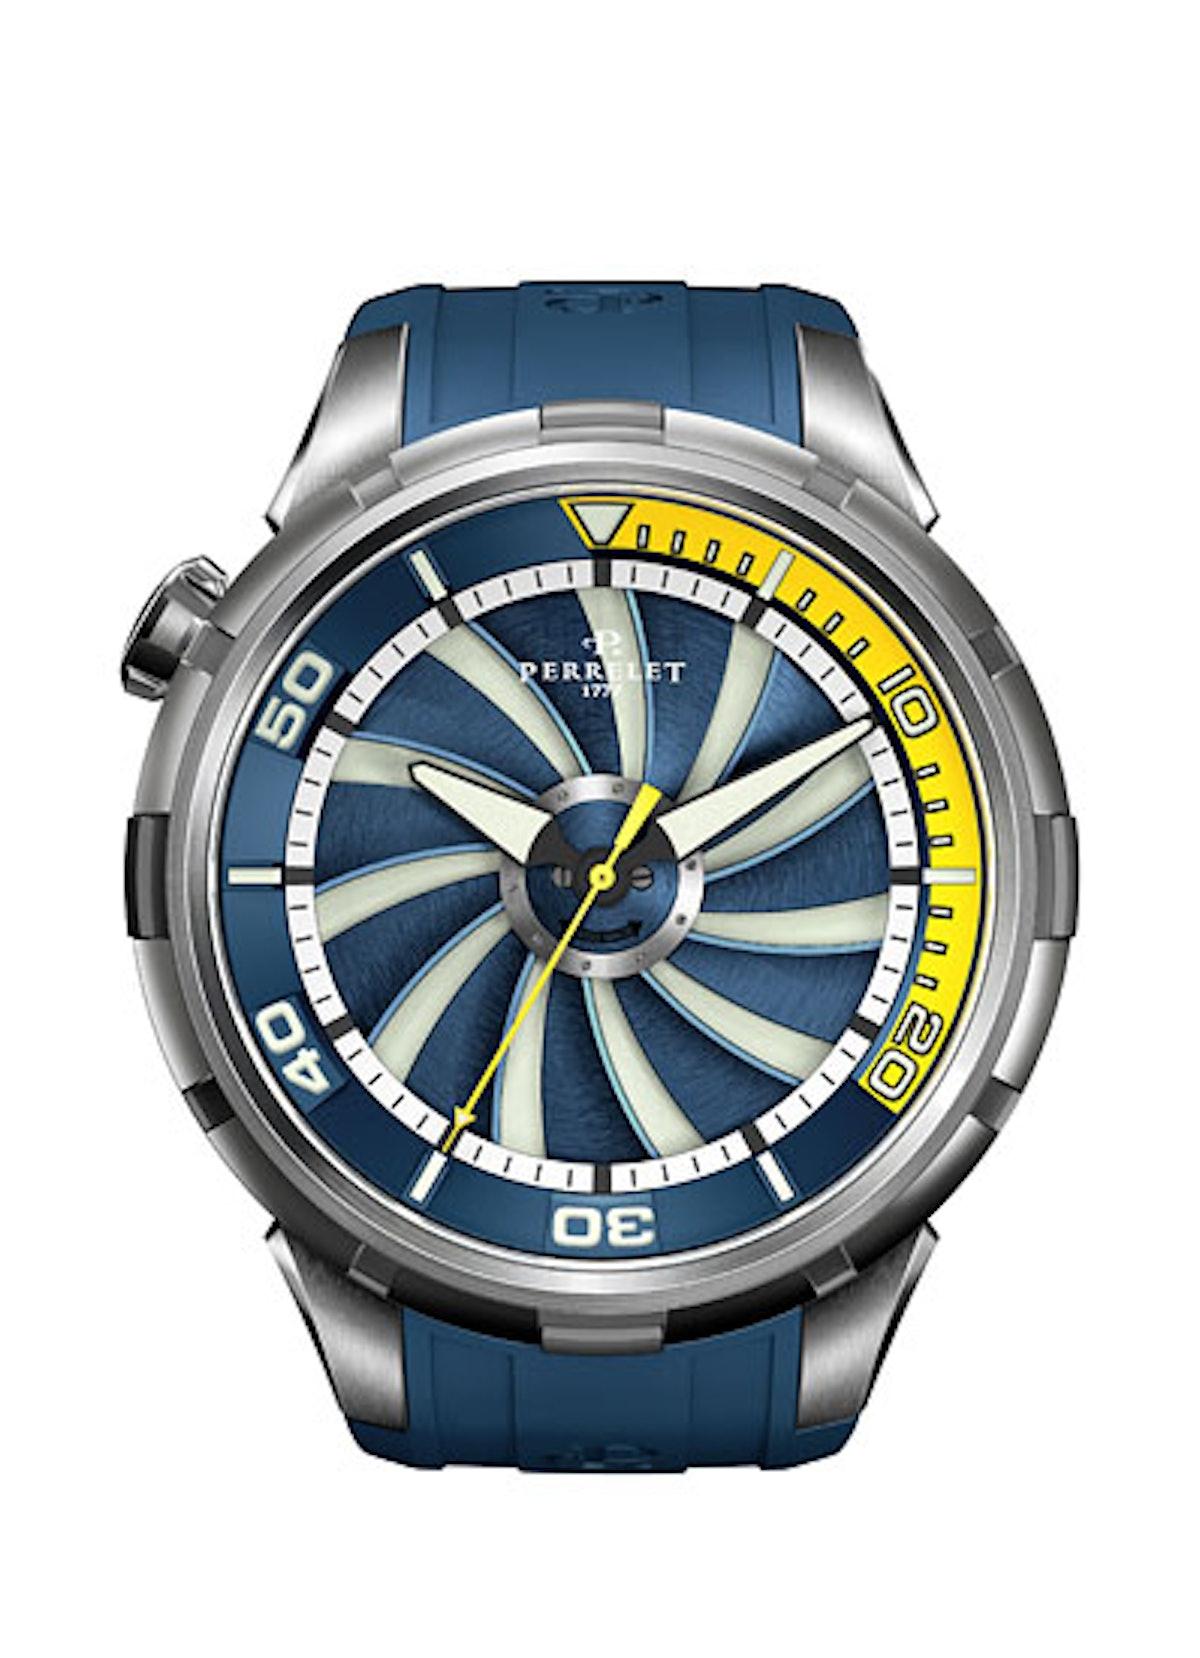 acss-basel-watches-roundup-07-v.jpg